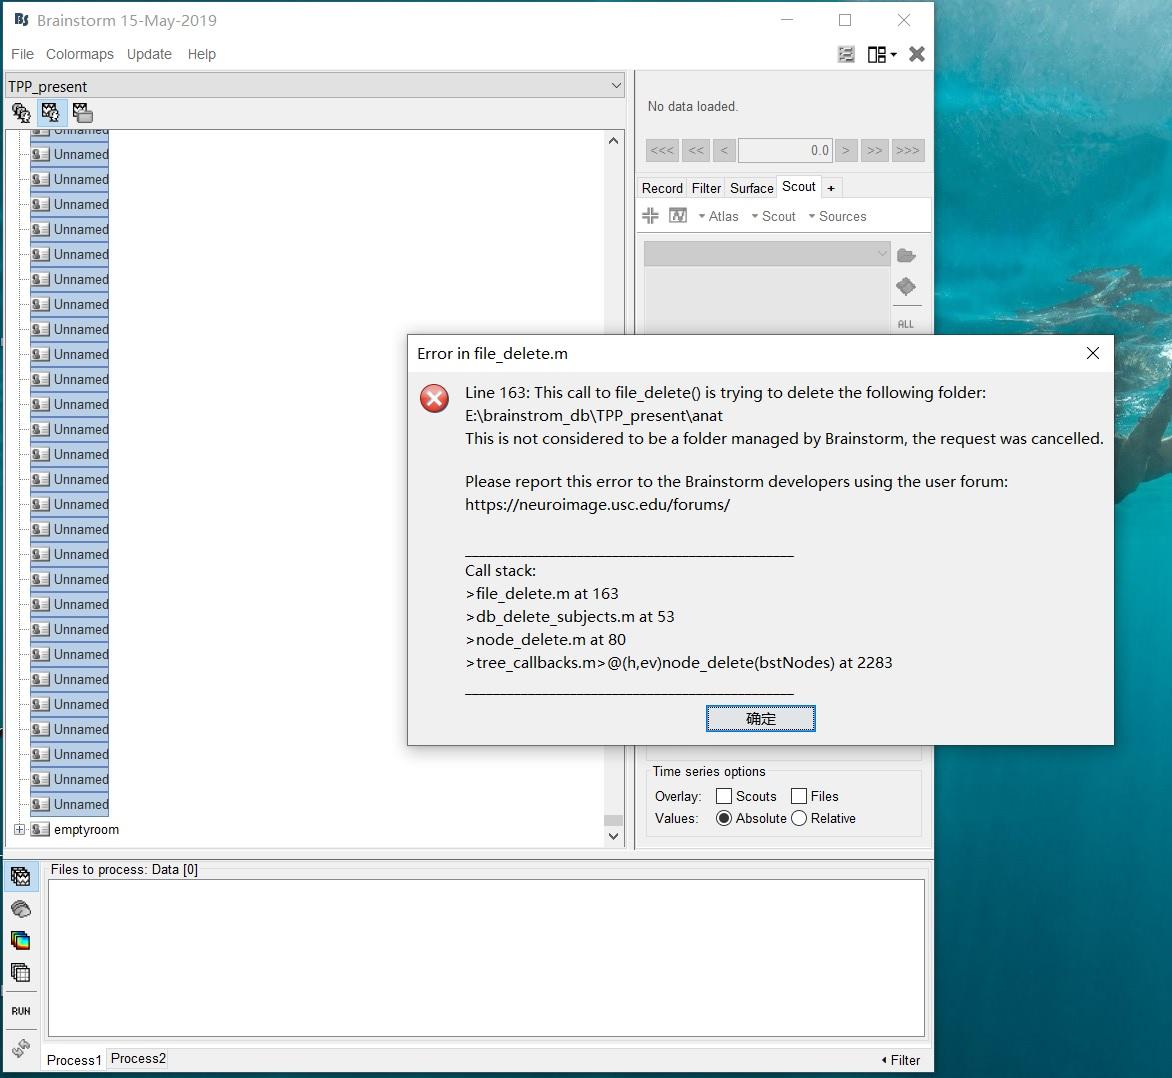 Cannot delete subject folder - Bugs - Brainstorm